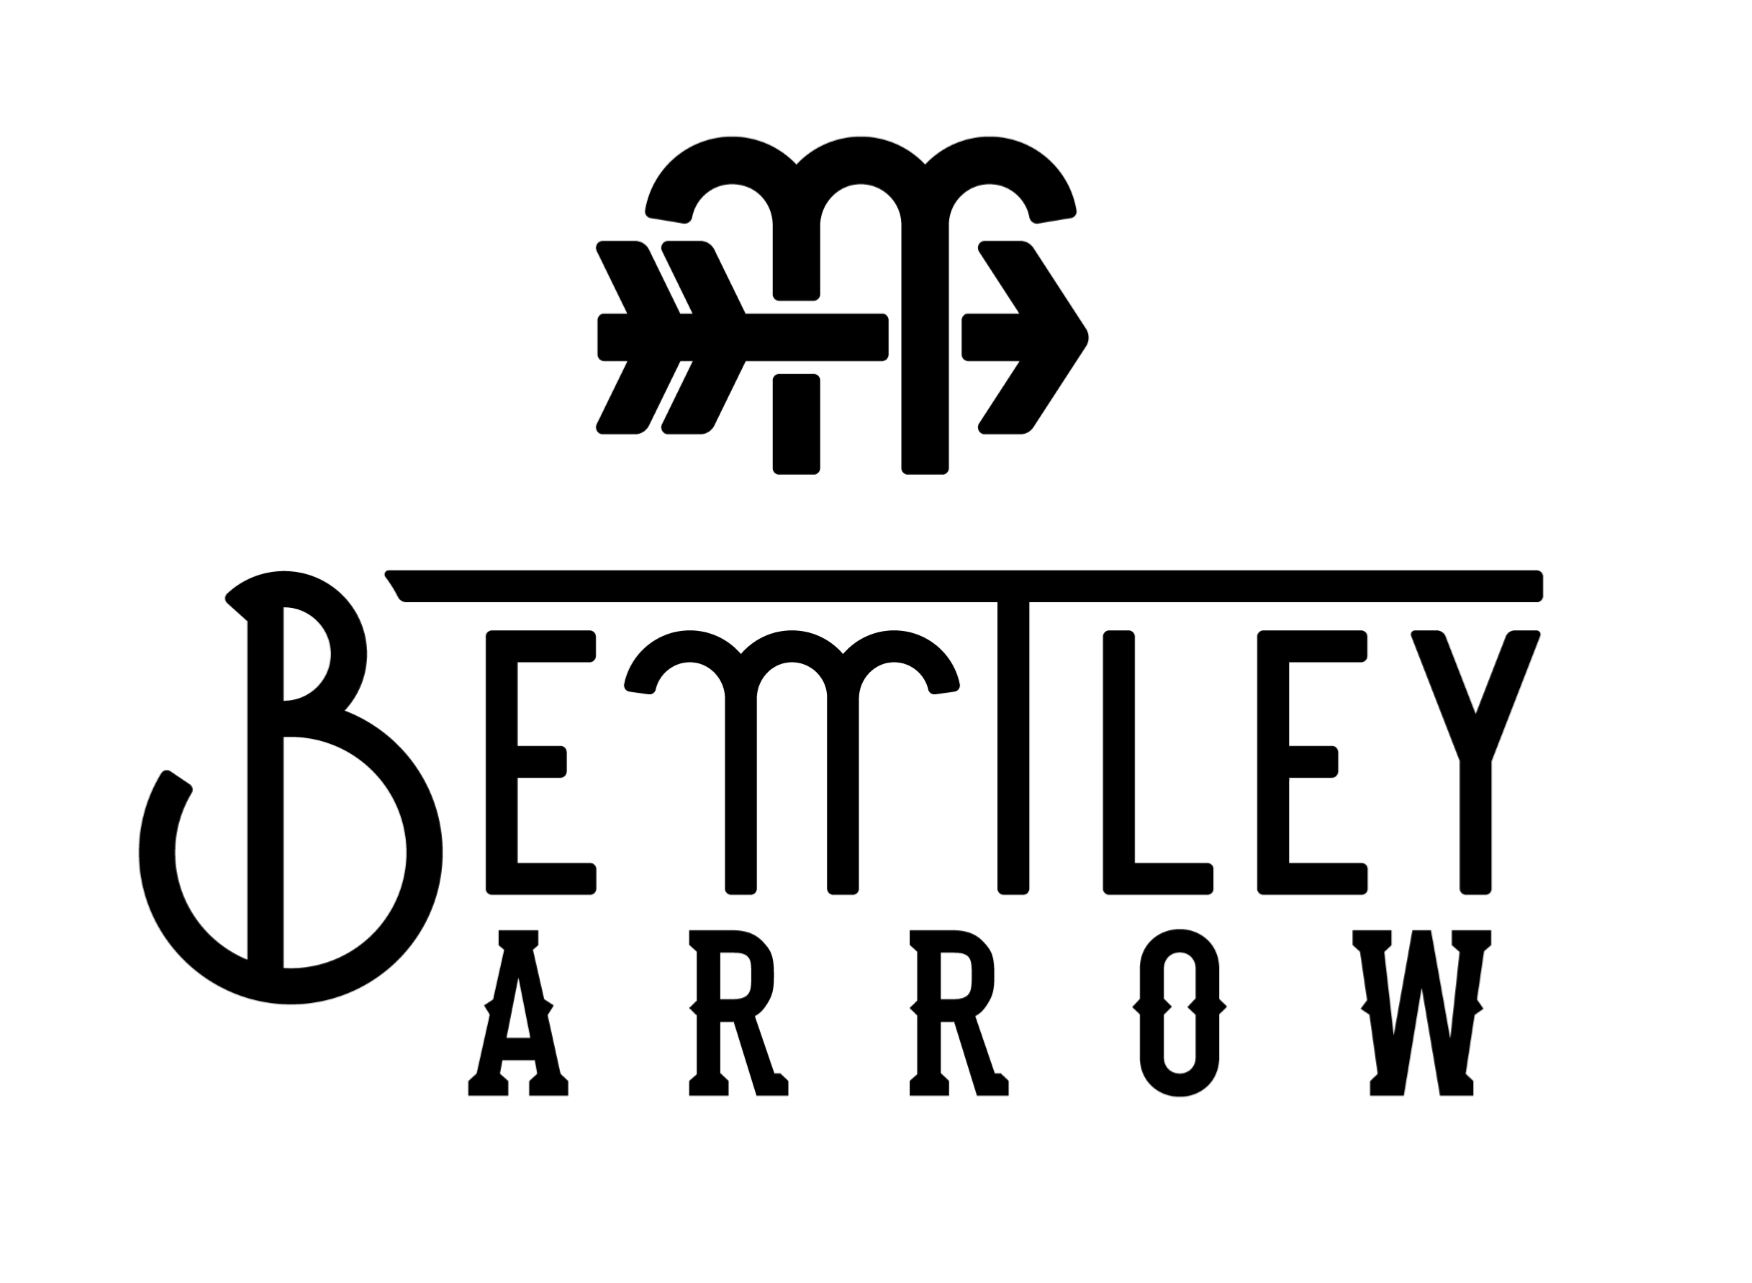 bently arrow.JPG